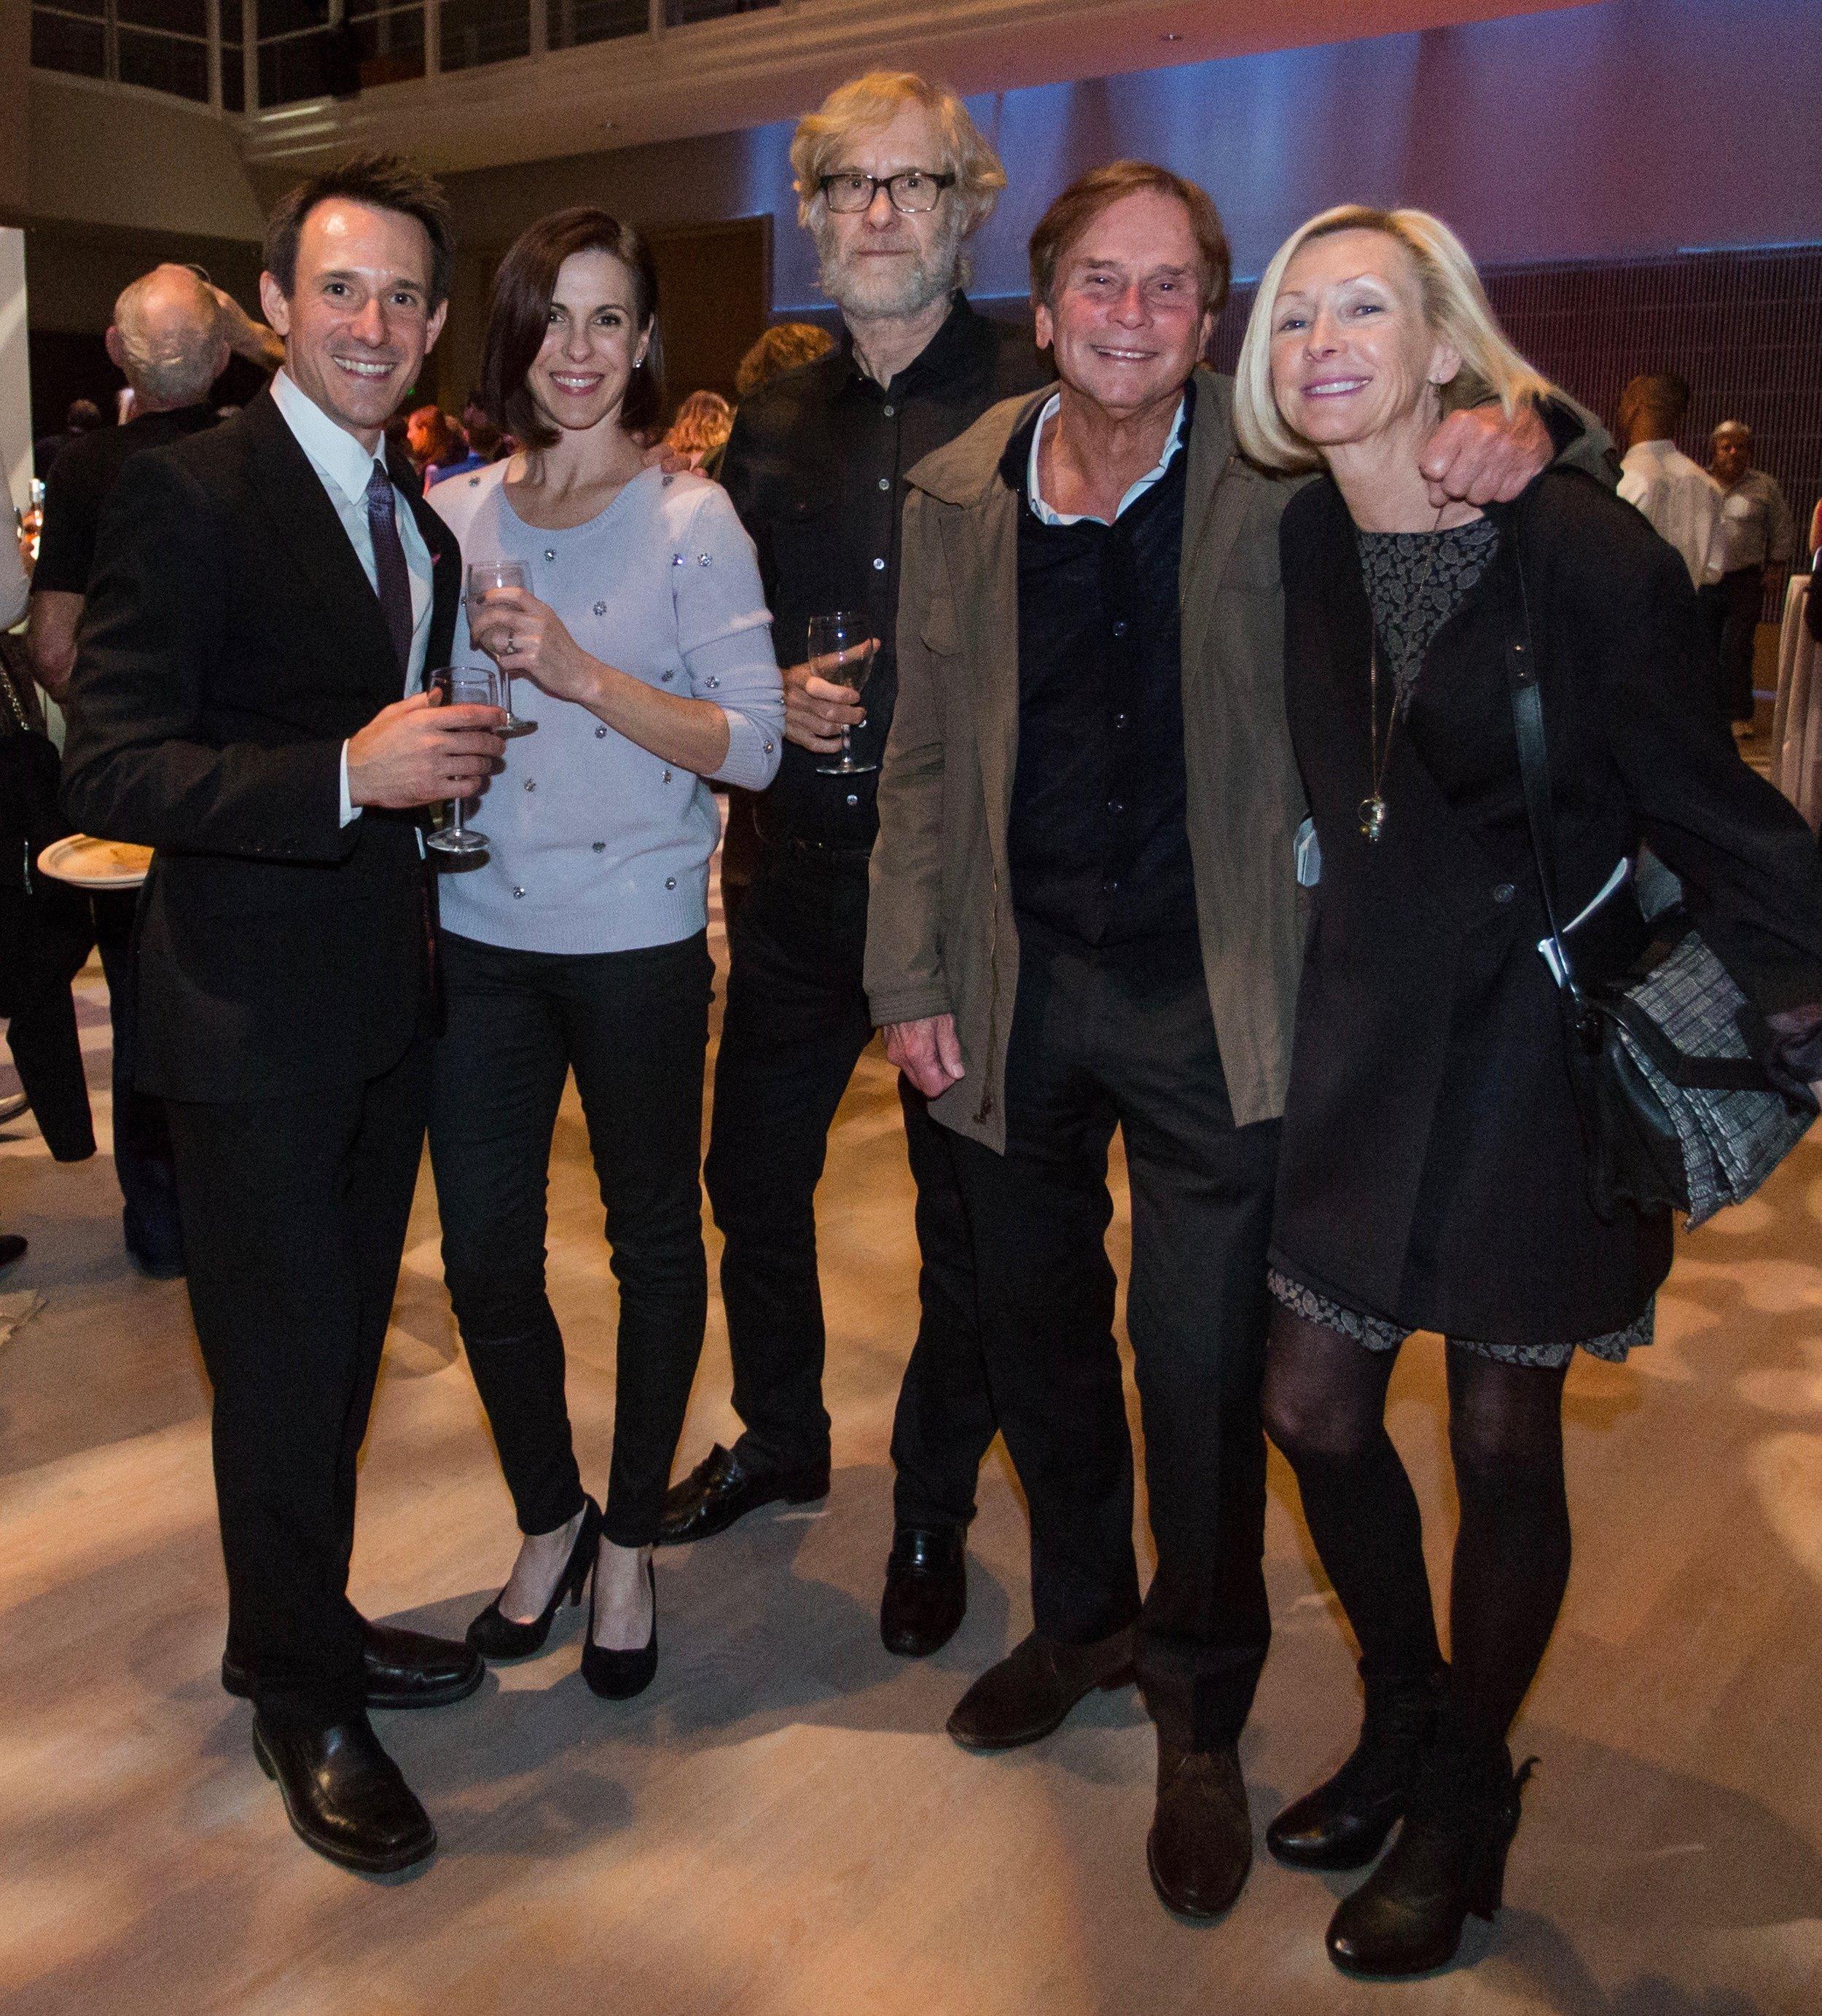 DanceFAR co-founder James Sofranko, Cynthia Sheppard Sofranko, John Kerns, Tim Streb, Myra Gamble